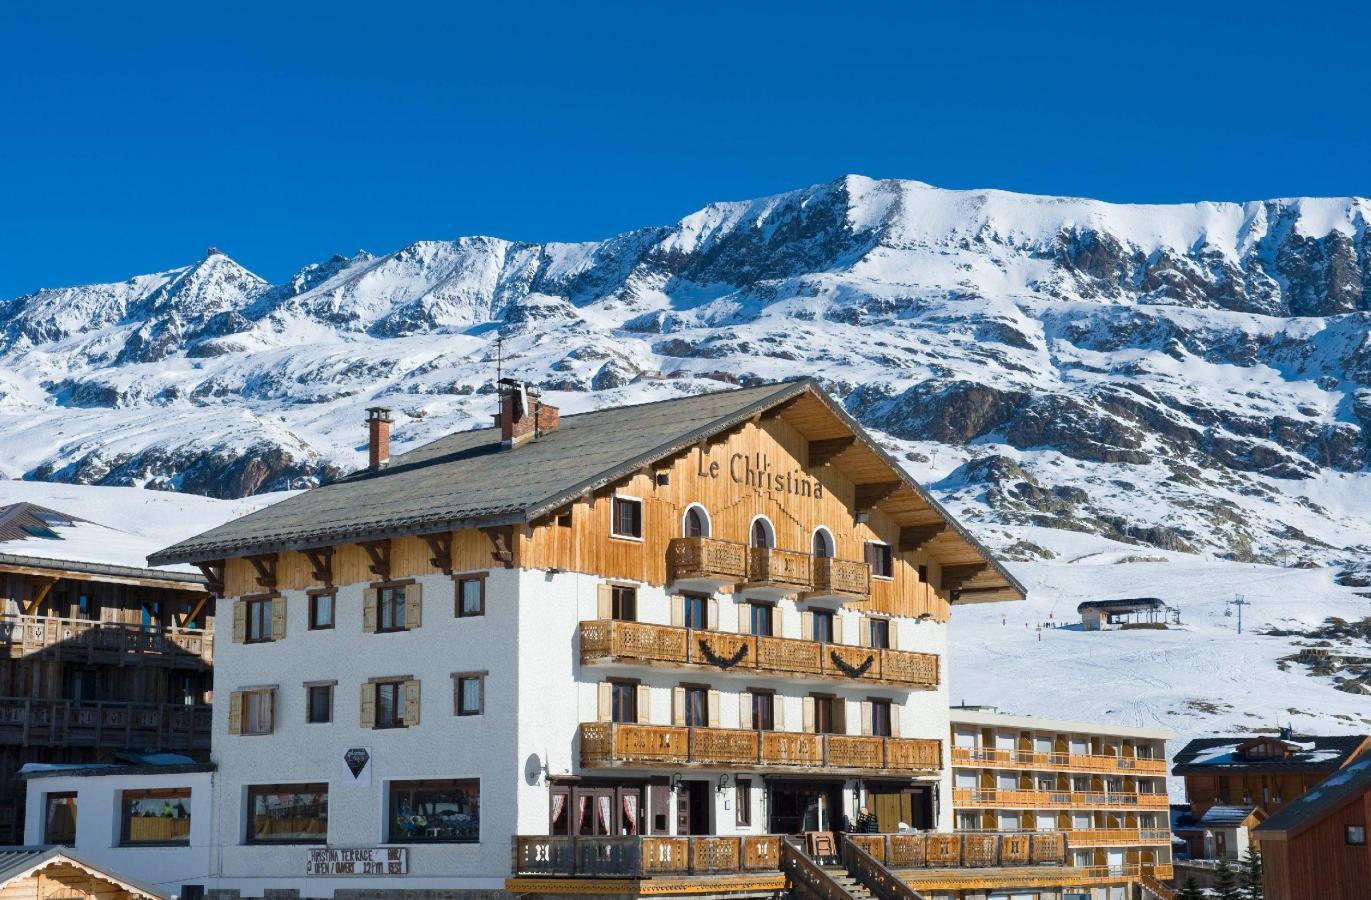 hotel le christina 20 alpe d 39 huez location vacances ski alpe d 39 huez ski planet. Black Bedroom Furniture Sets. Home Design Ideas